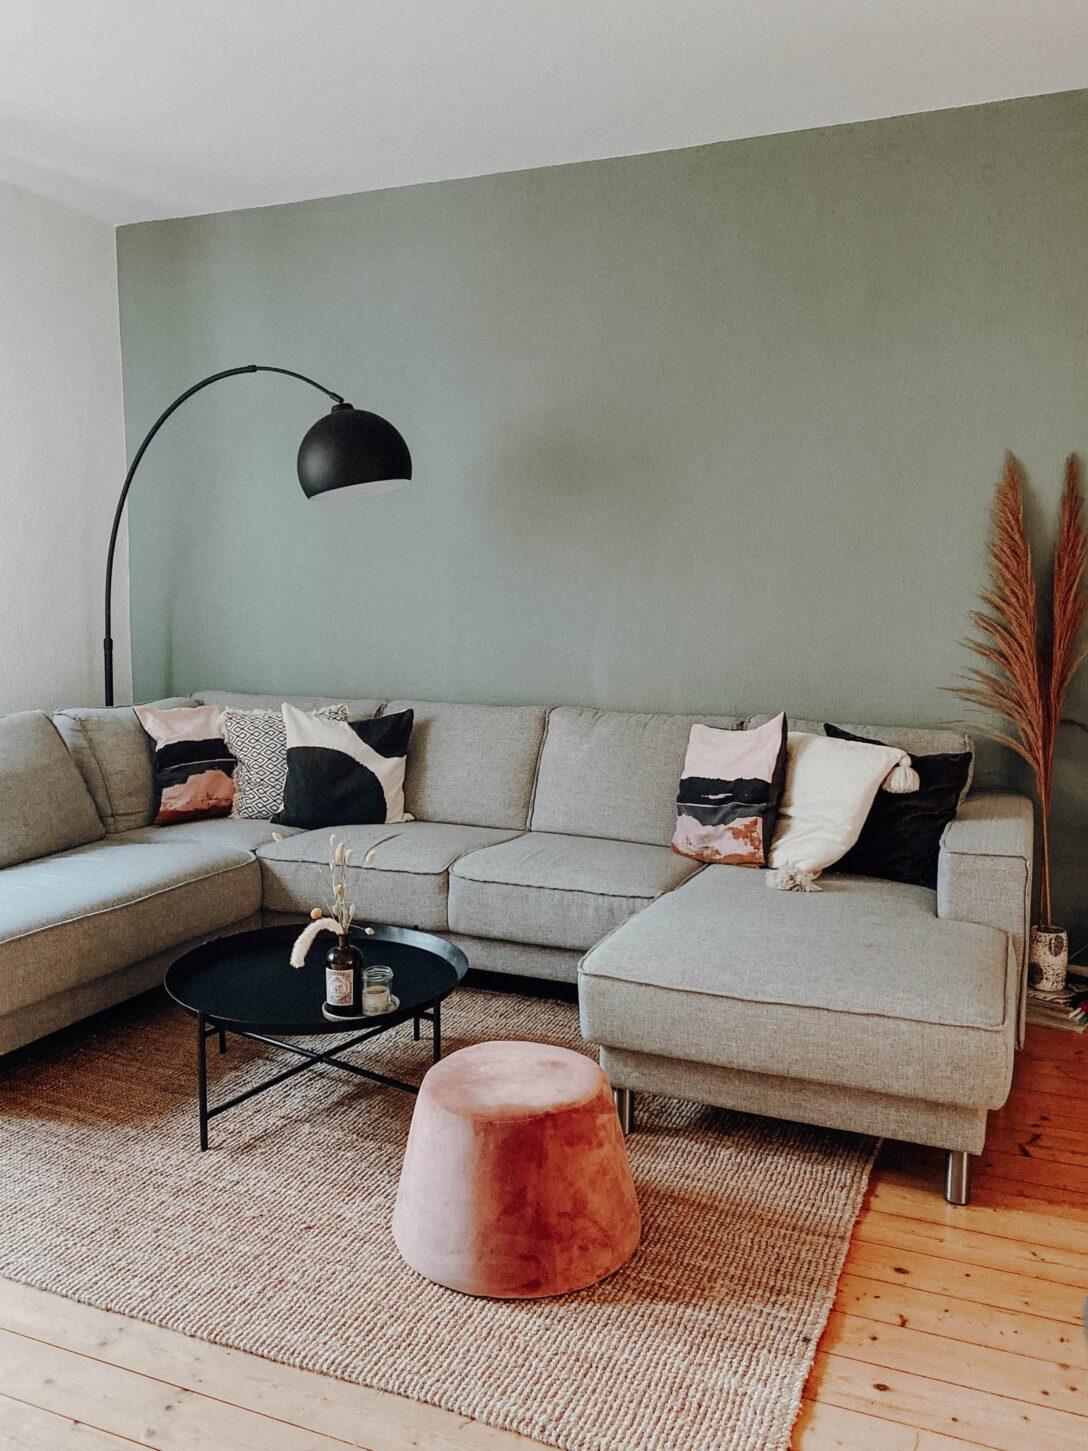 Large Size of Graues Sofa Ikea Graue Couch Welche Wandfarbe Passt Kissen Kombinieren Bunte Kleines Regal Große Englisches Hussen Für Polster Boxspring Blaues Delife Antik Sofa Graues Sofa